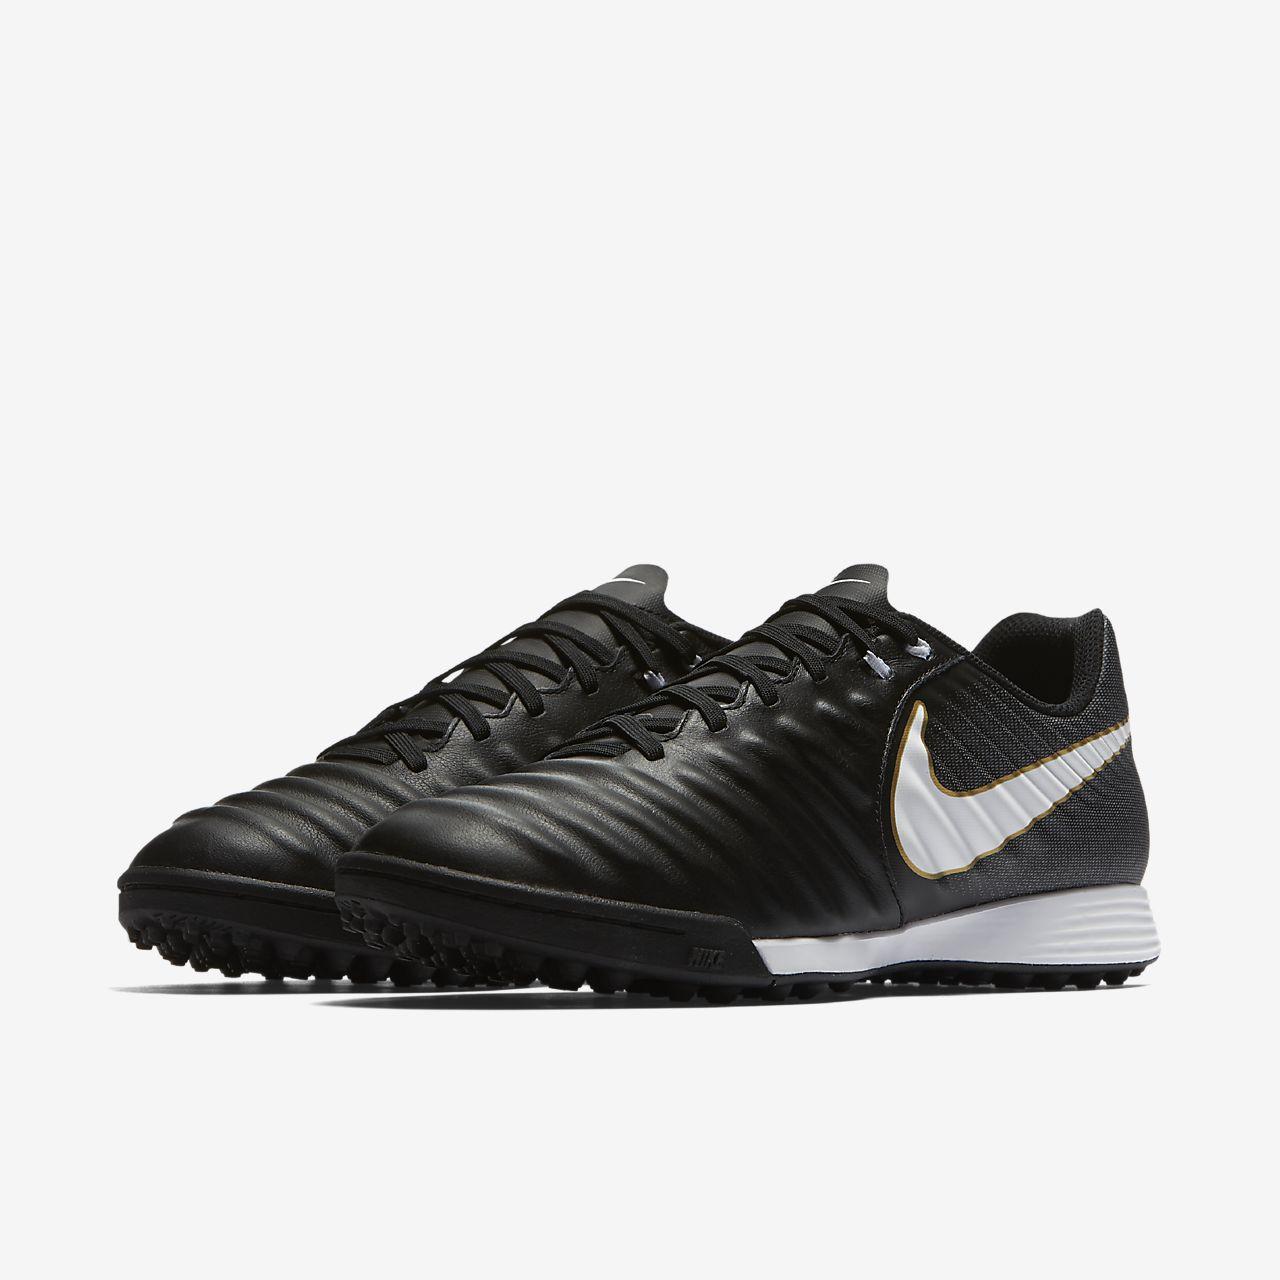 Nike Tiempox Ligera Iv TF, Chaussures de Football Homme, Noir (Black/White/Black 002), 47.5 EU